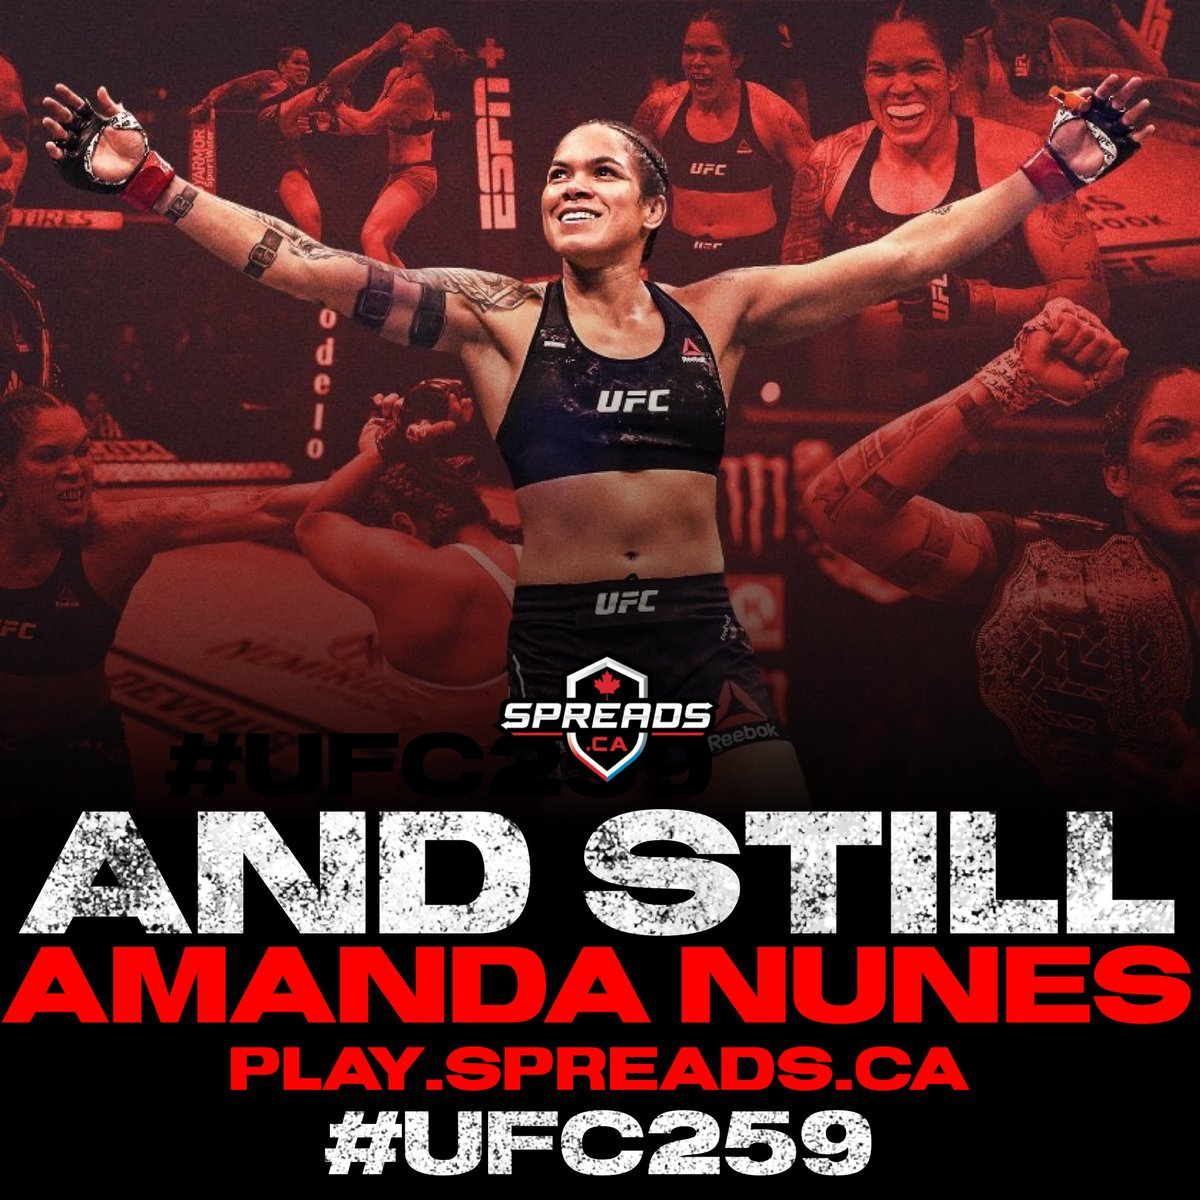 Baddest woman on the planet, @amanda_leoa #UFC259 🇧🇷  @stylebender vs @janblachowicz NEXT❗️  —  #ufc #ufcfightnight #mma #mmafighter #boxing #conormcgregor #ufcfighter #kickboxing #khabibnurmagomedov #mmatraining #fight #bjj #muaythai #ufcmoscow #ufcrussia #wrestling #bellator